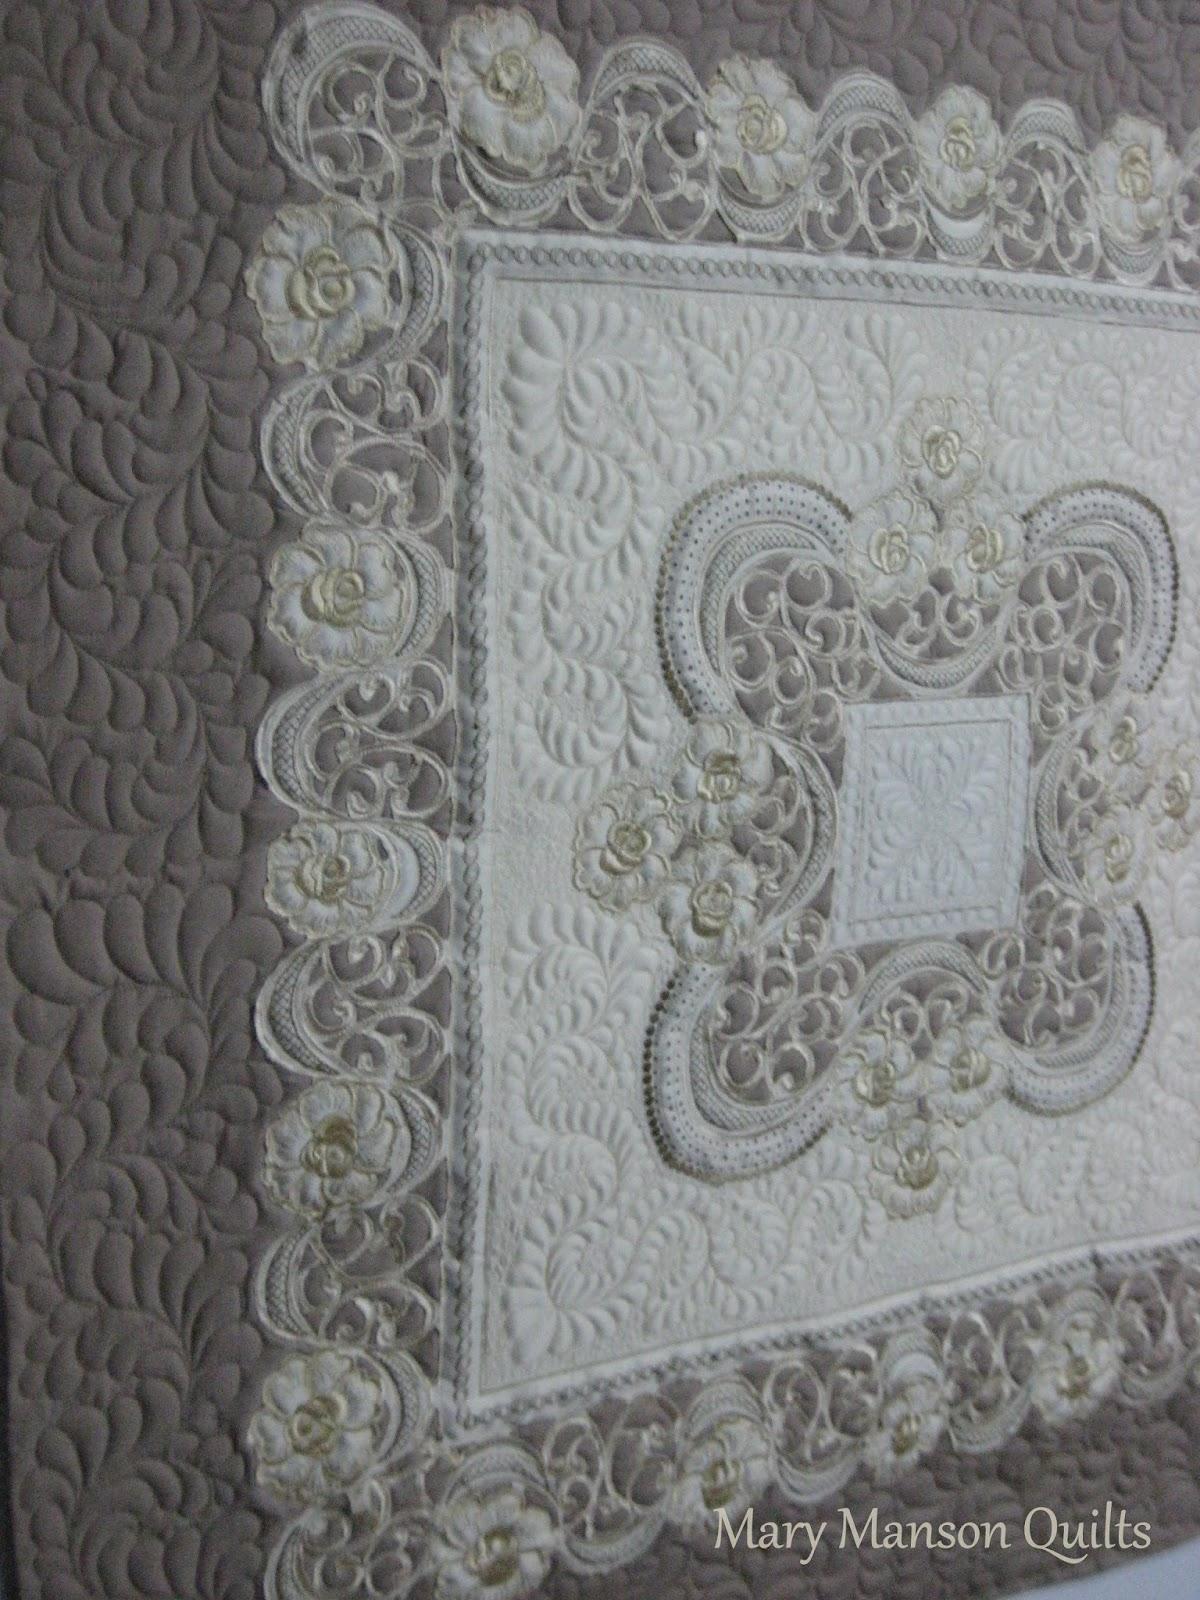 Homemade Wedding Quilts